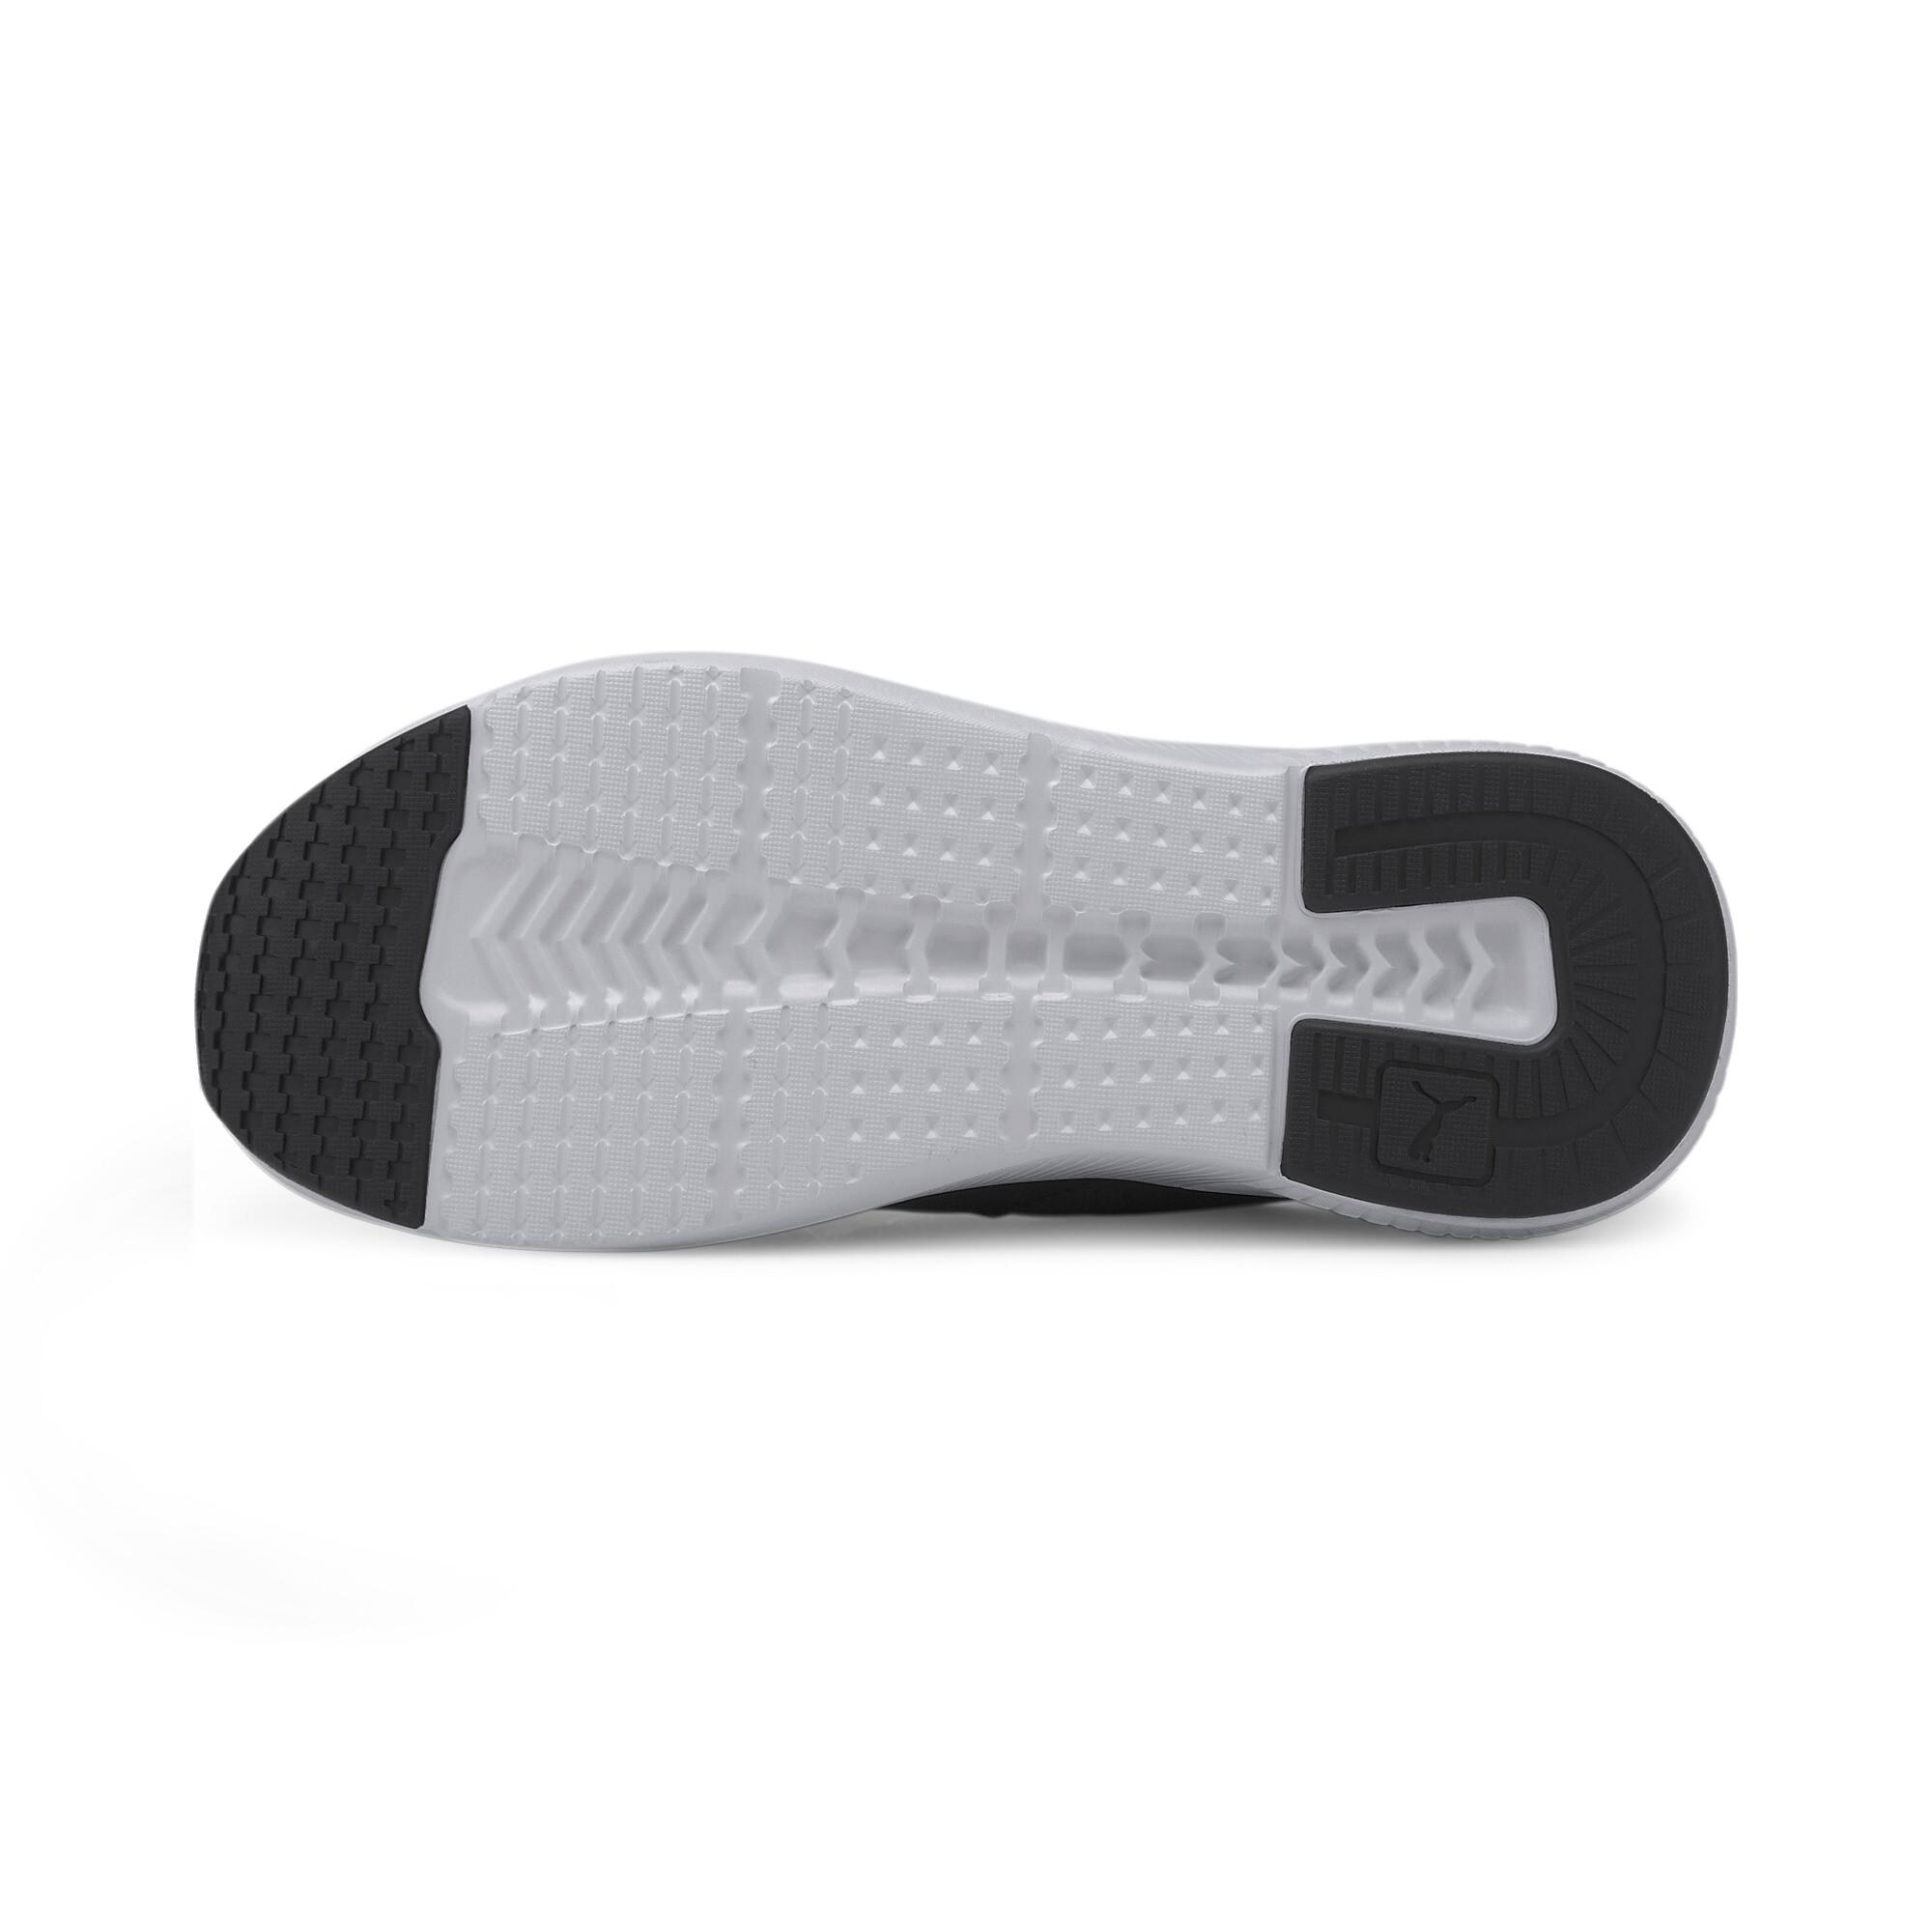 thumbnail 20 - PUMA-Women-039-s-Platinum-Training-Shoes